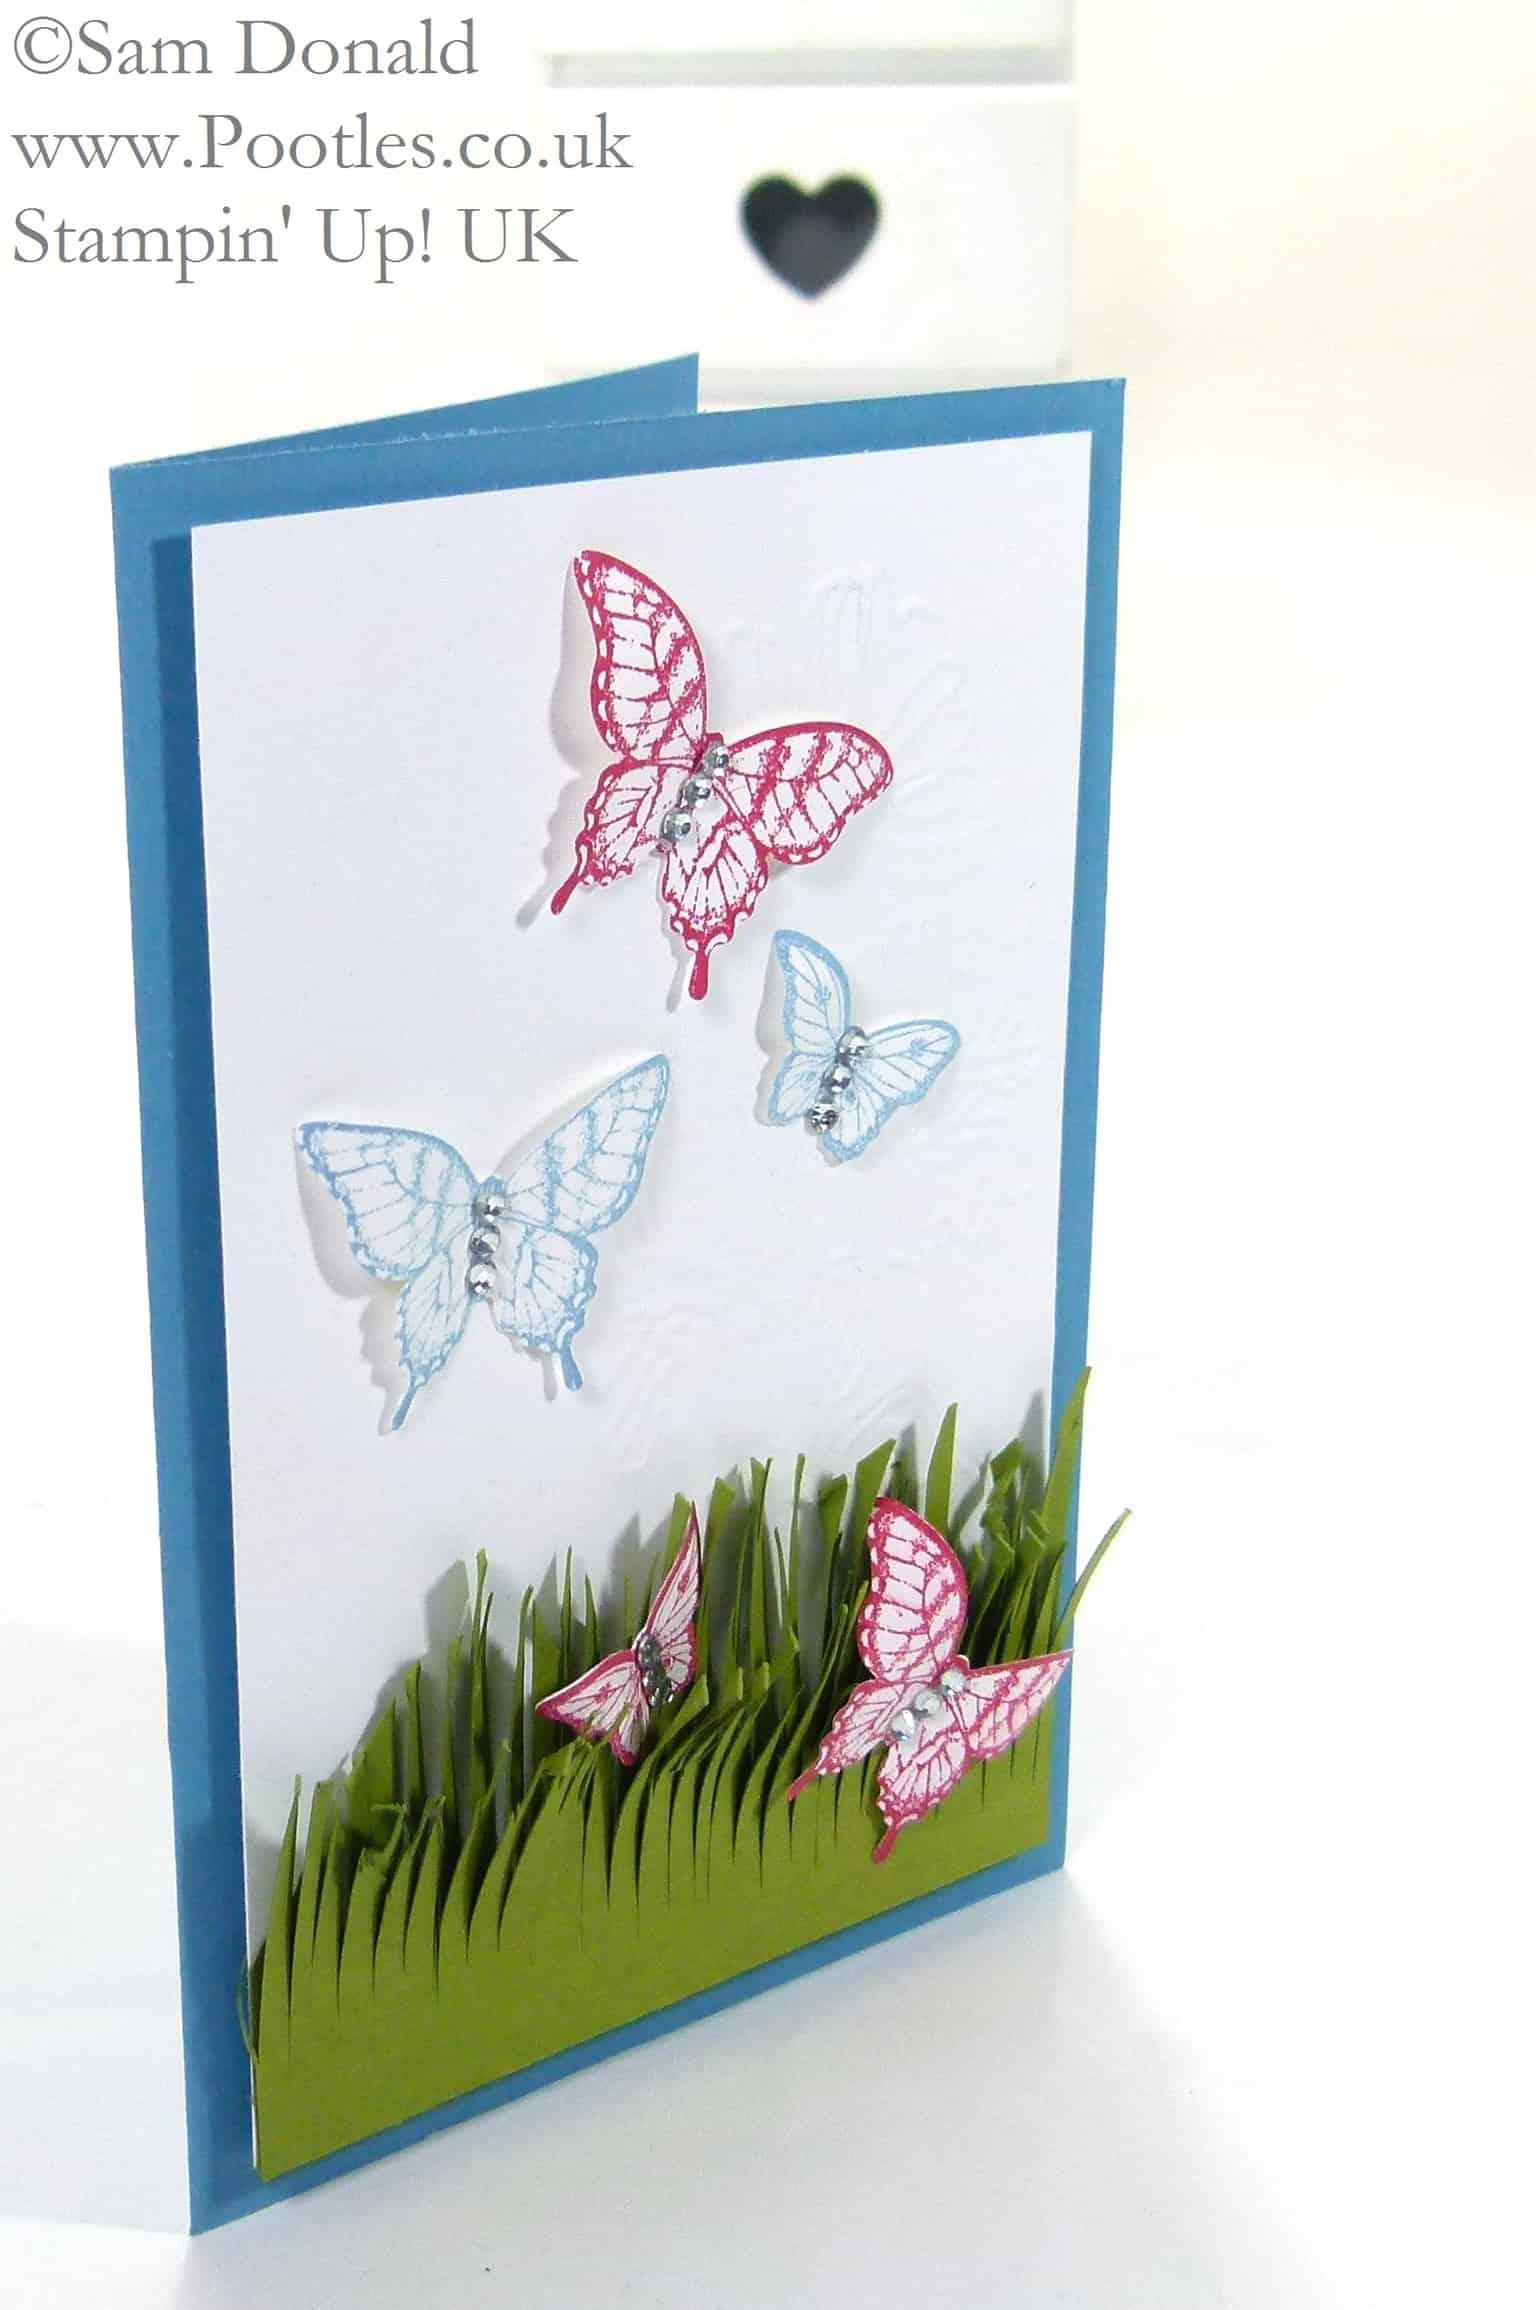 POOTLES Stampin' Up! UK Papillon Pot Pourri meets the Fringe Scissors 2